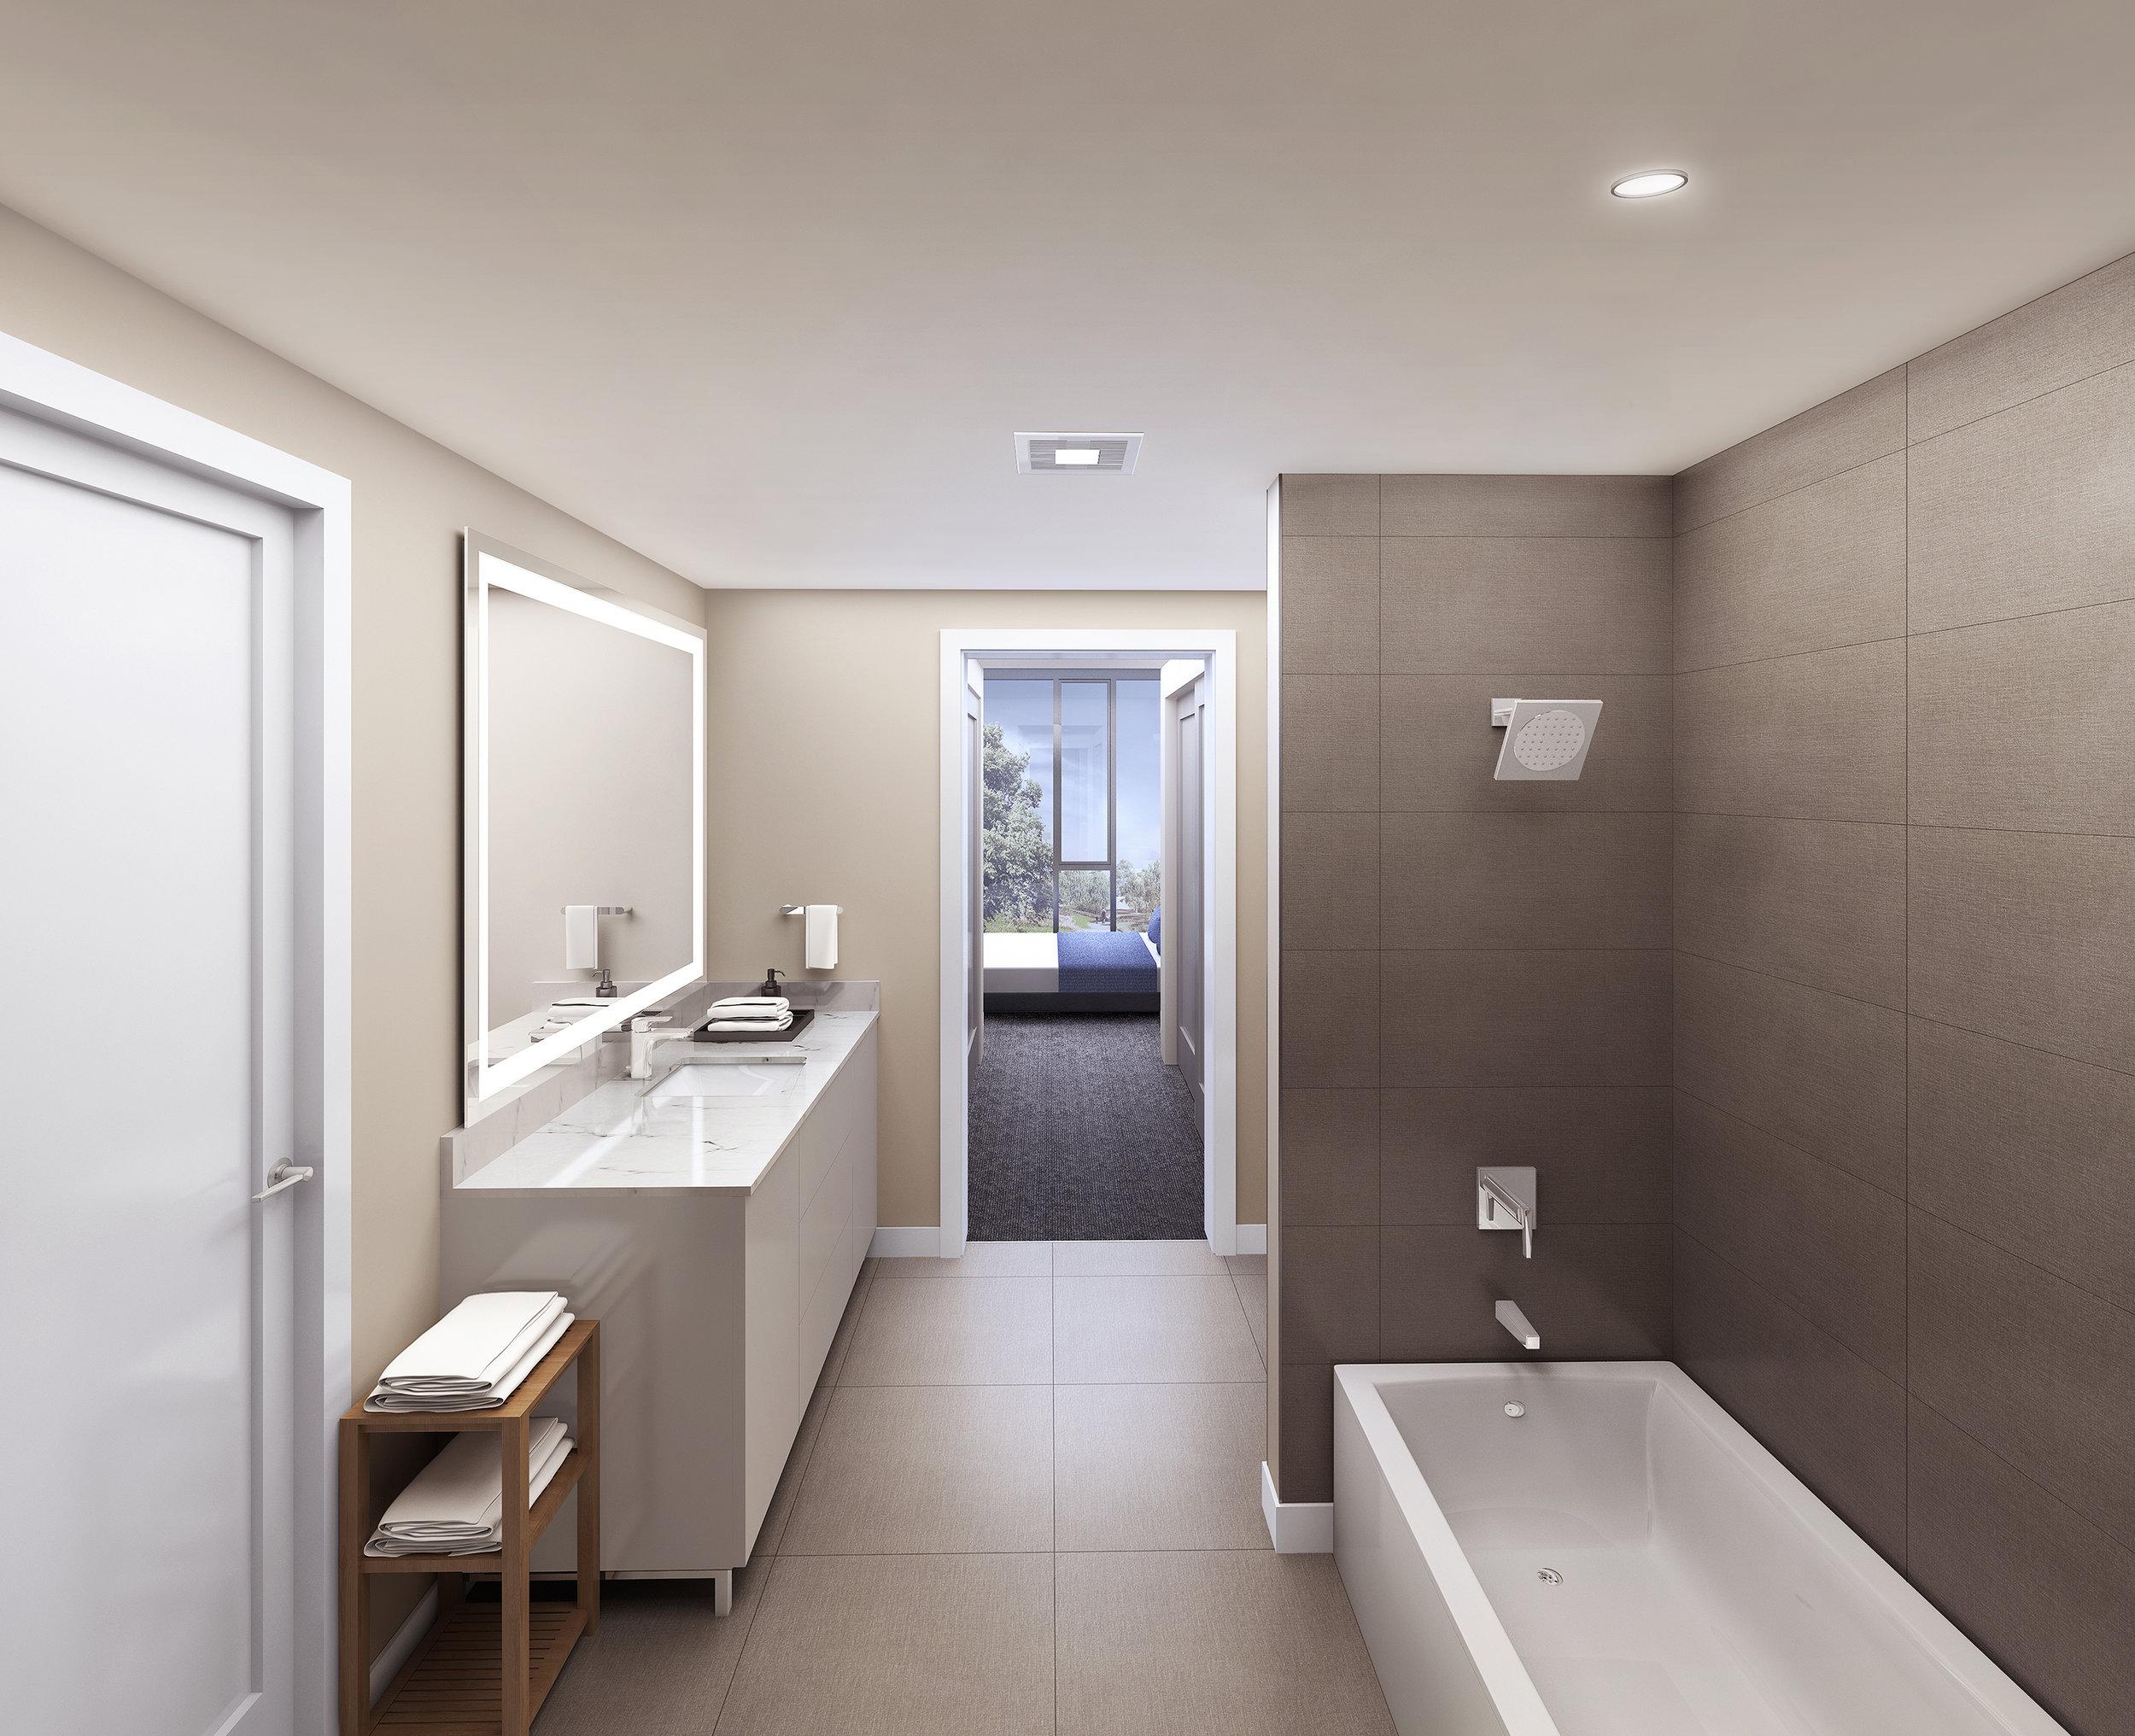 koda seattle condos bathroom layout